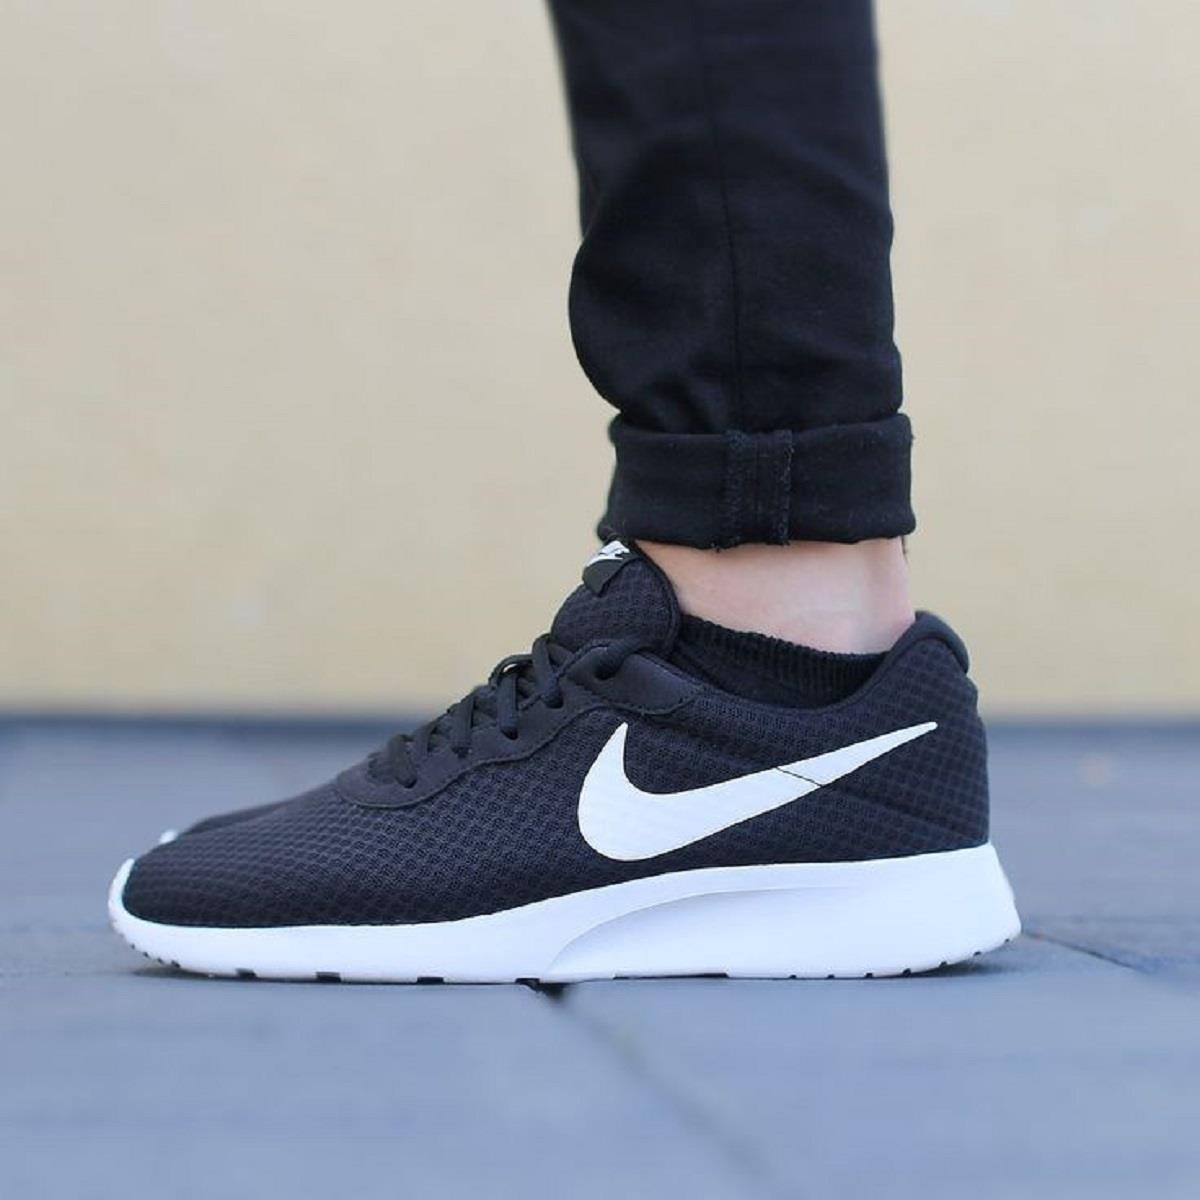 Nike Tanjun Uomo Nero 812654 011 modello Roshe Run — Punto Moda ... 126183d061e